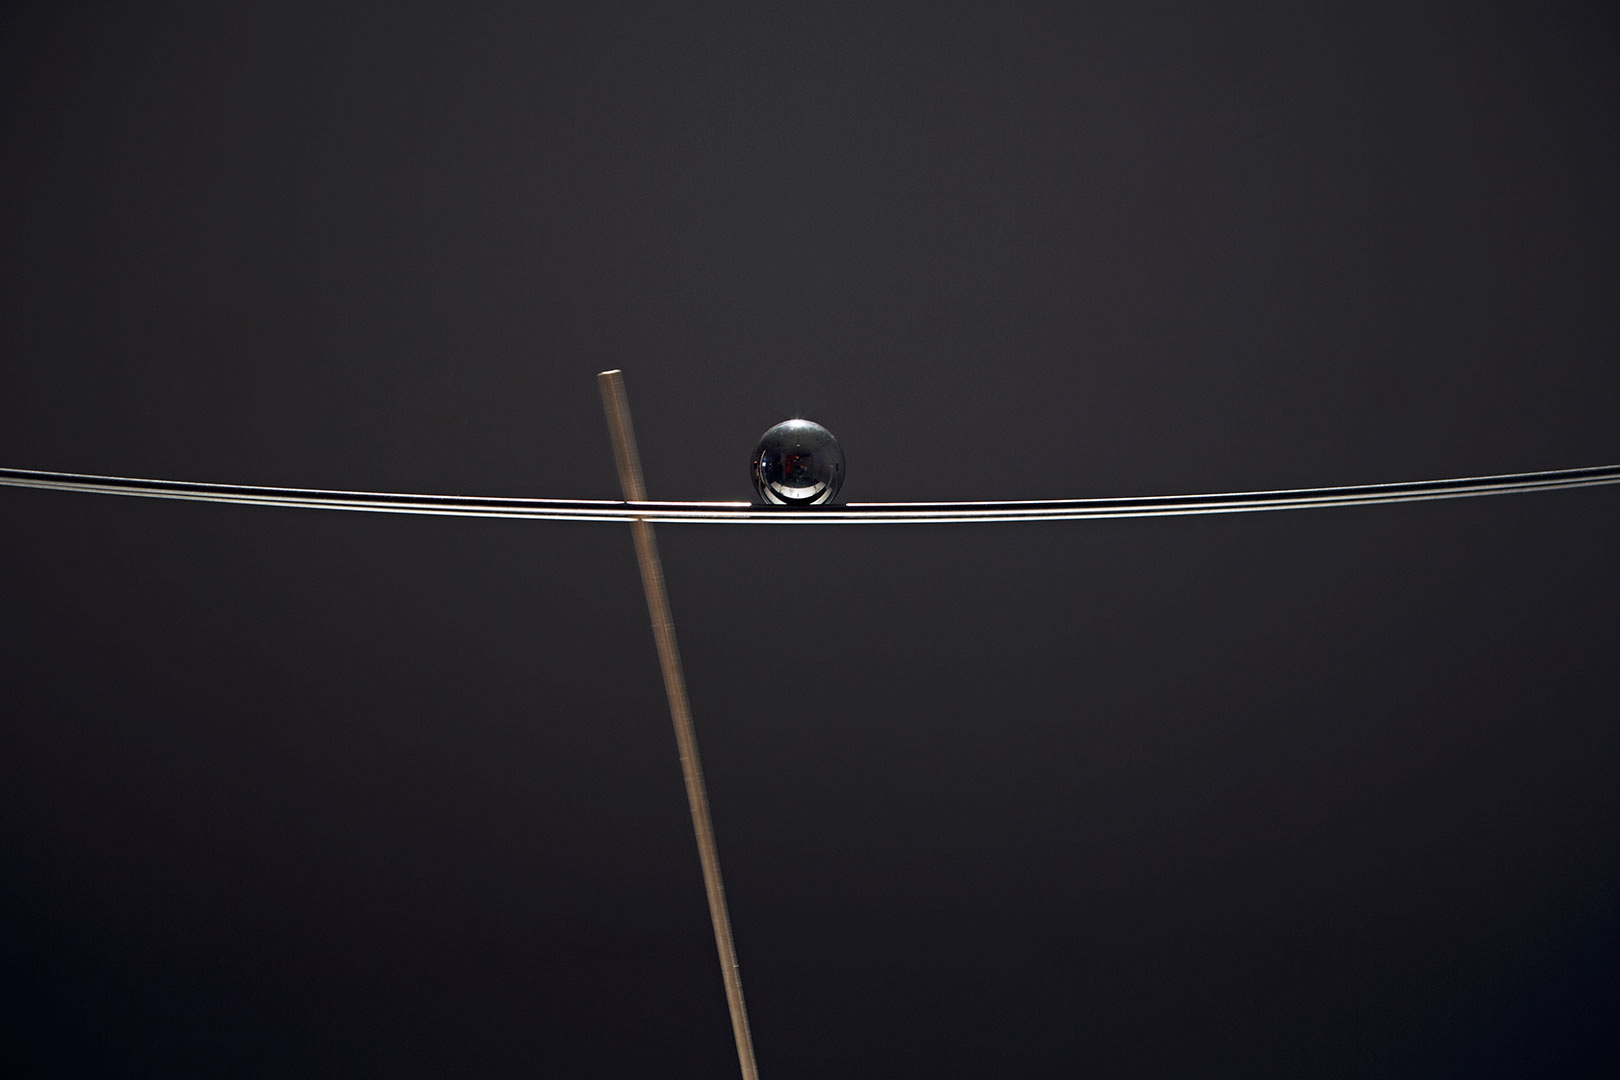 rlon_asymptote_1_sphere_1.jpg